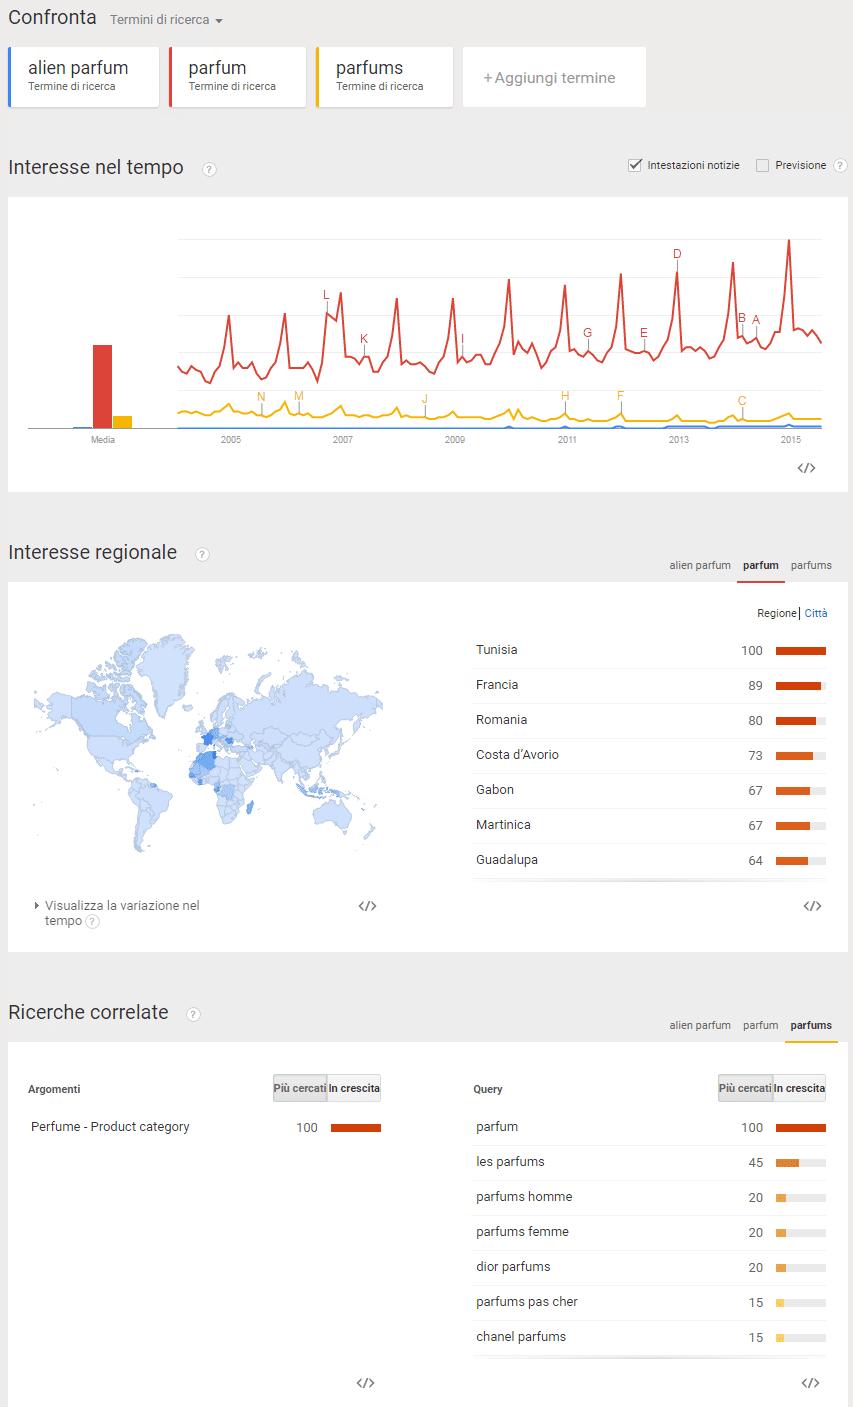 Google Trend - Interesse per Ricerca Google alien parfum, parfum, parfums -